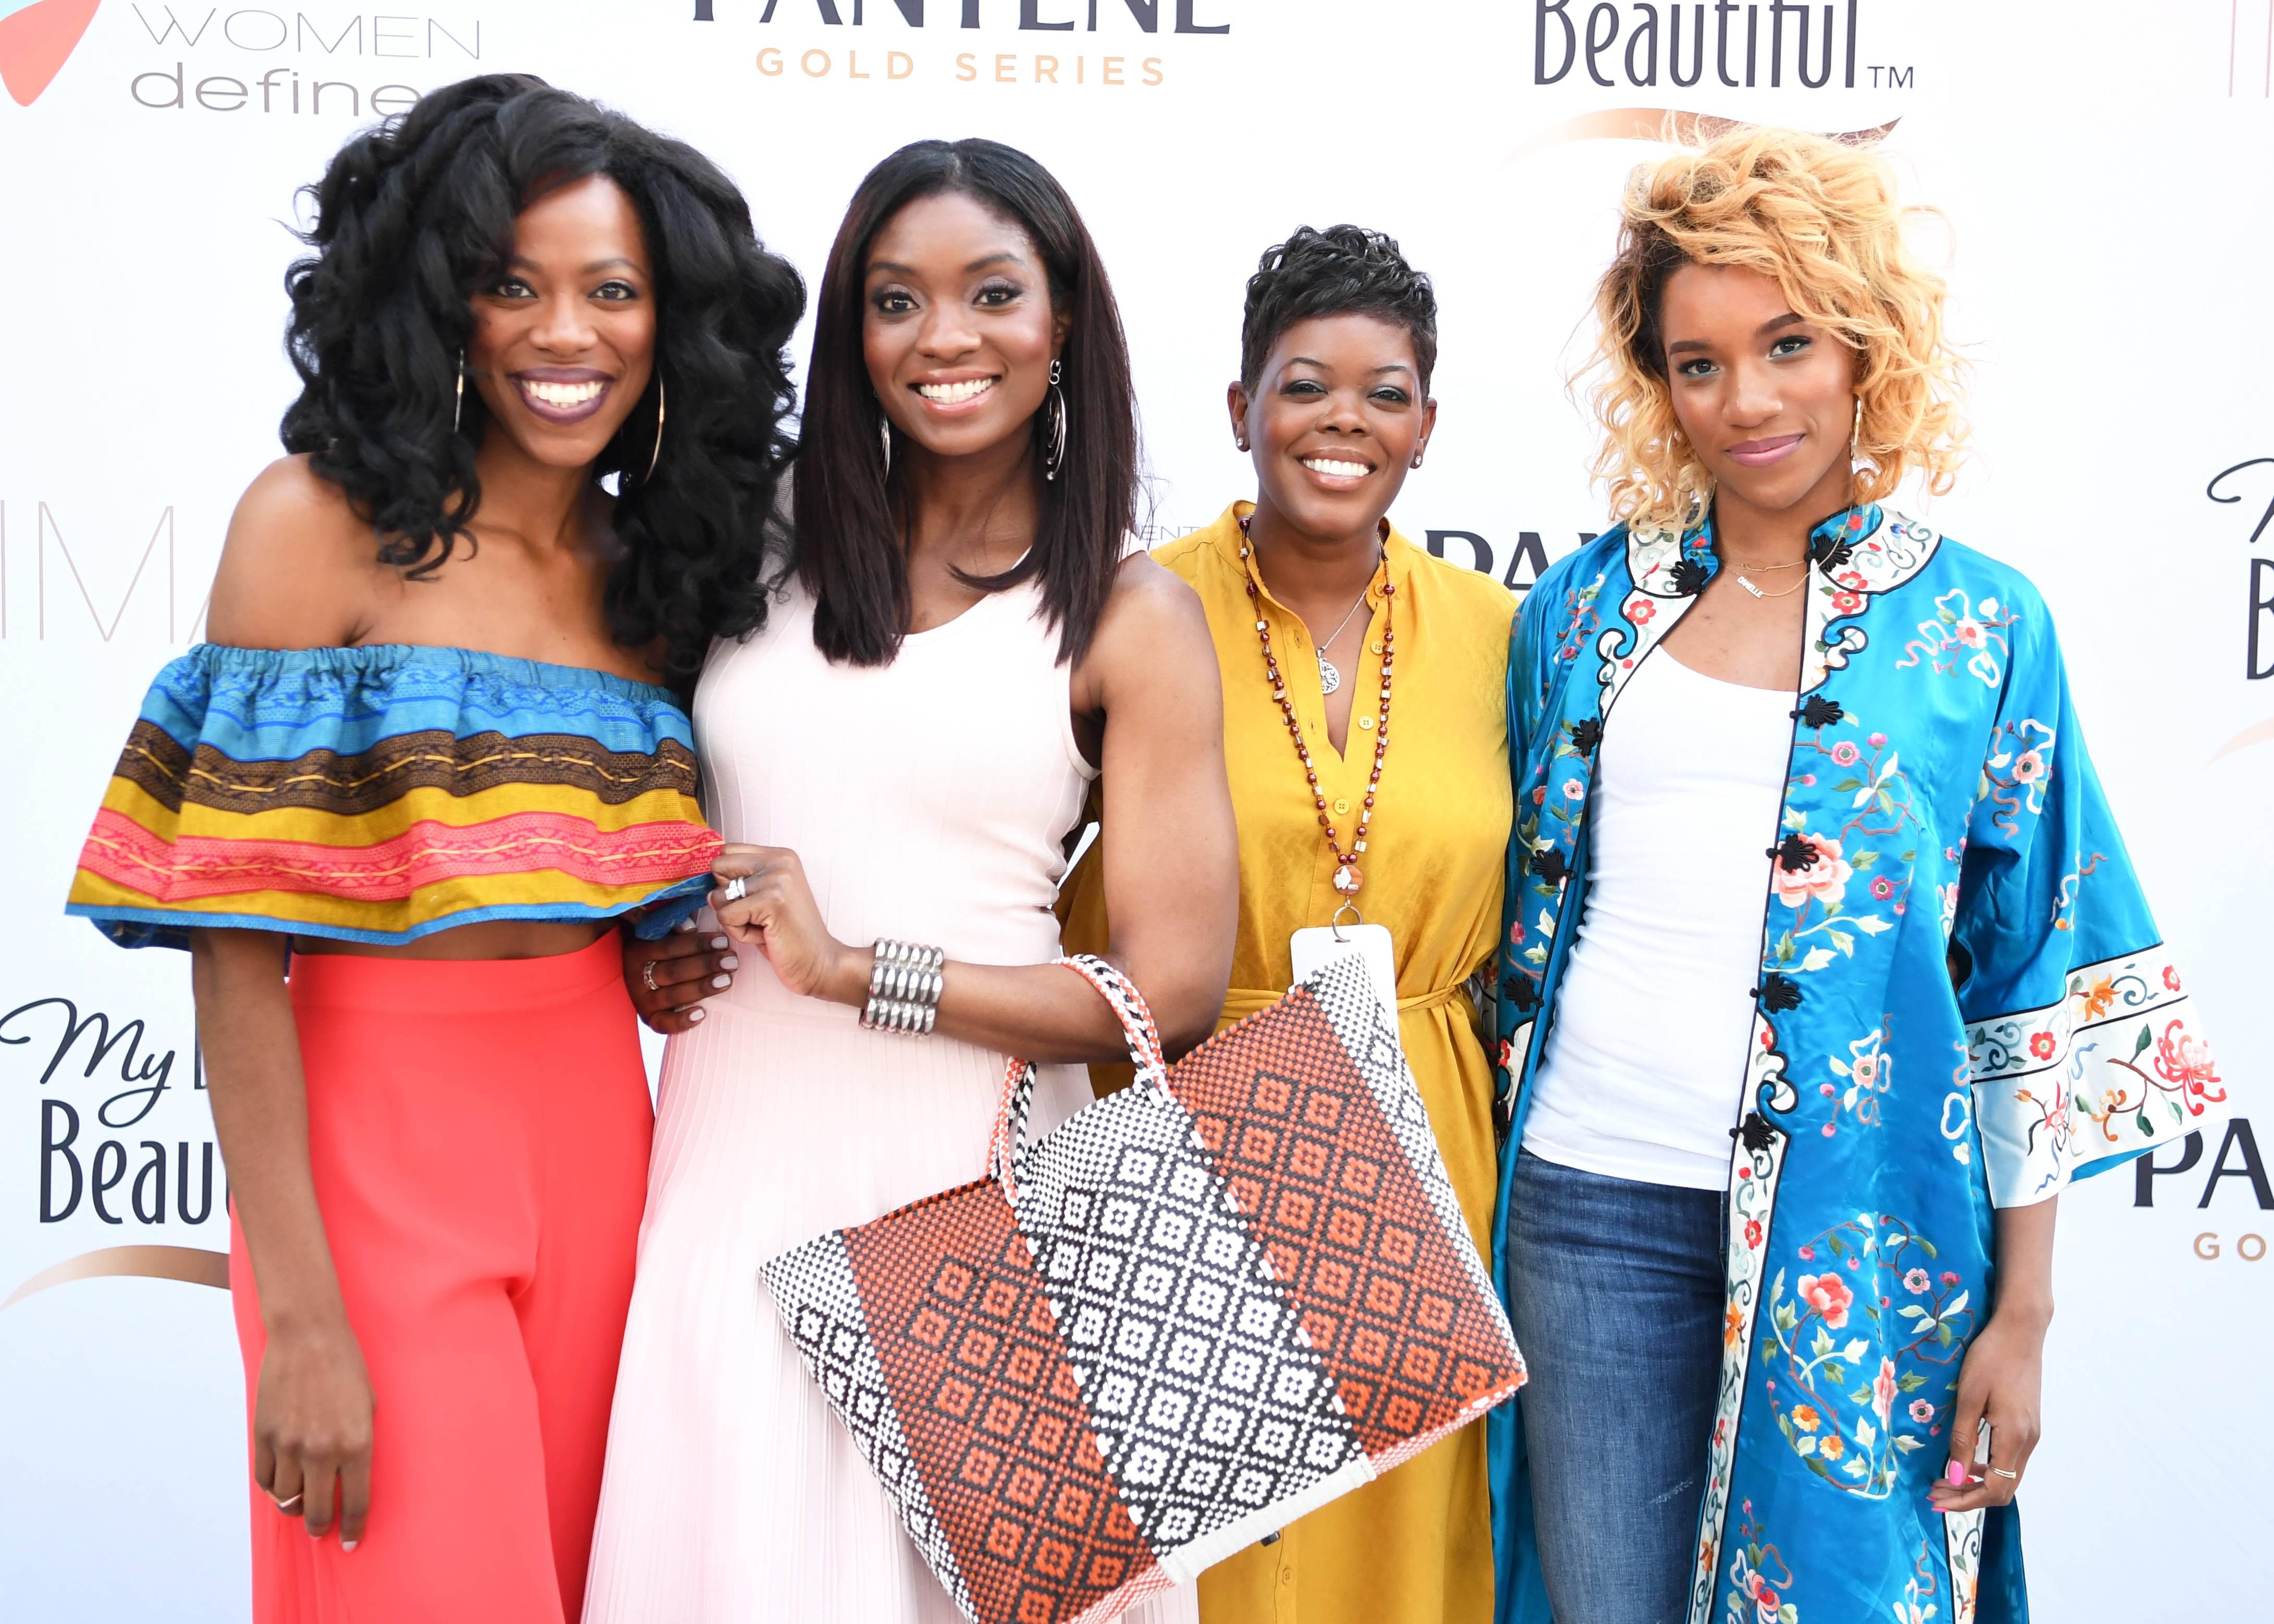 Yvonne Orji, Lola Ogunnaiake, Tina Wells, and Danielle Prescod - (Photo: Phelan Marc/BET)